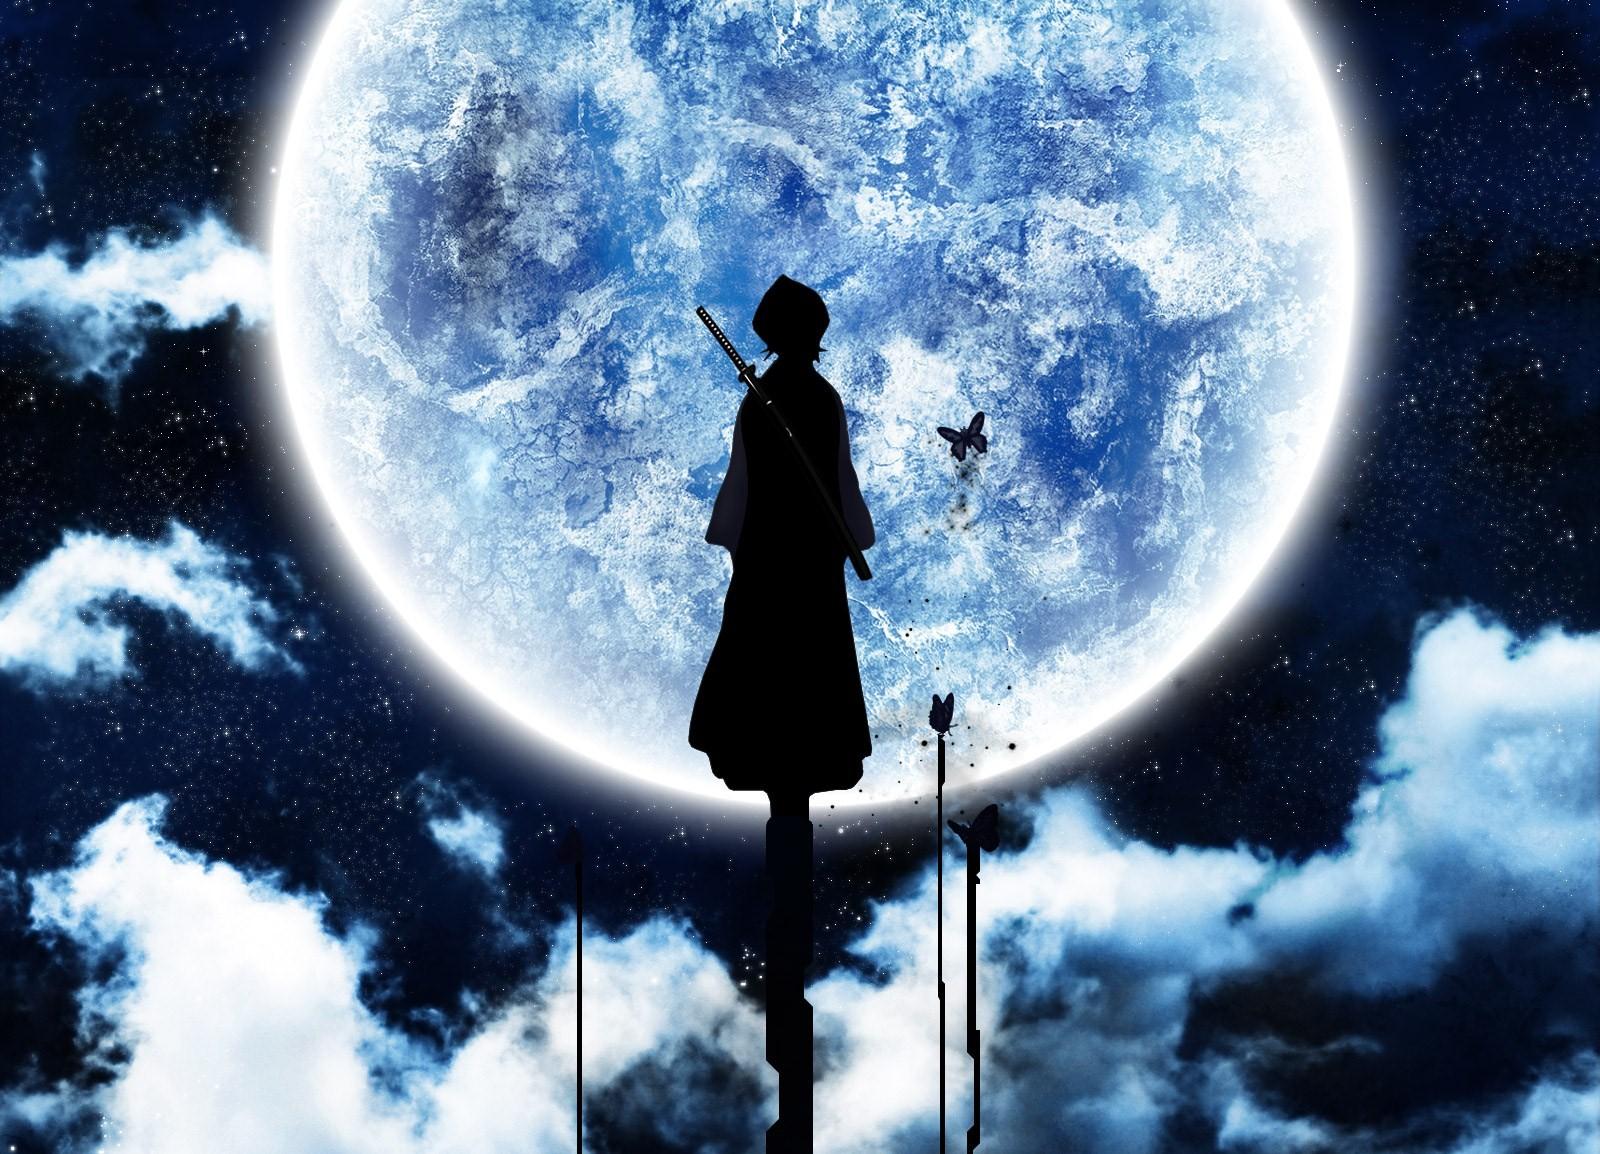 Cute Computer Desktop Wallpaper Girl Rukia Bleach Anime Full Moon Night Anime